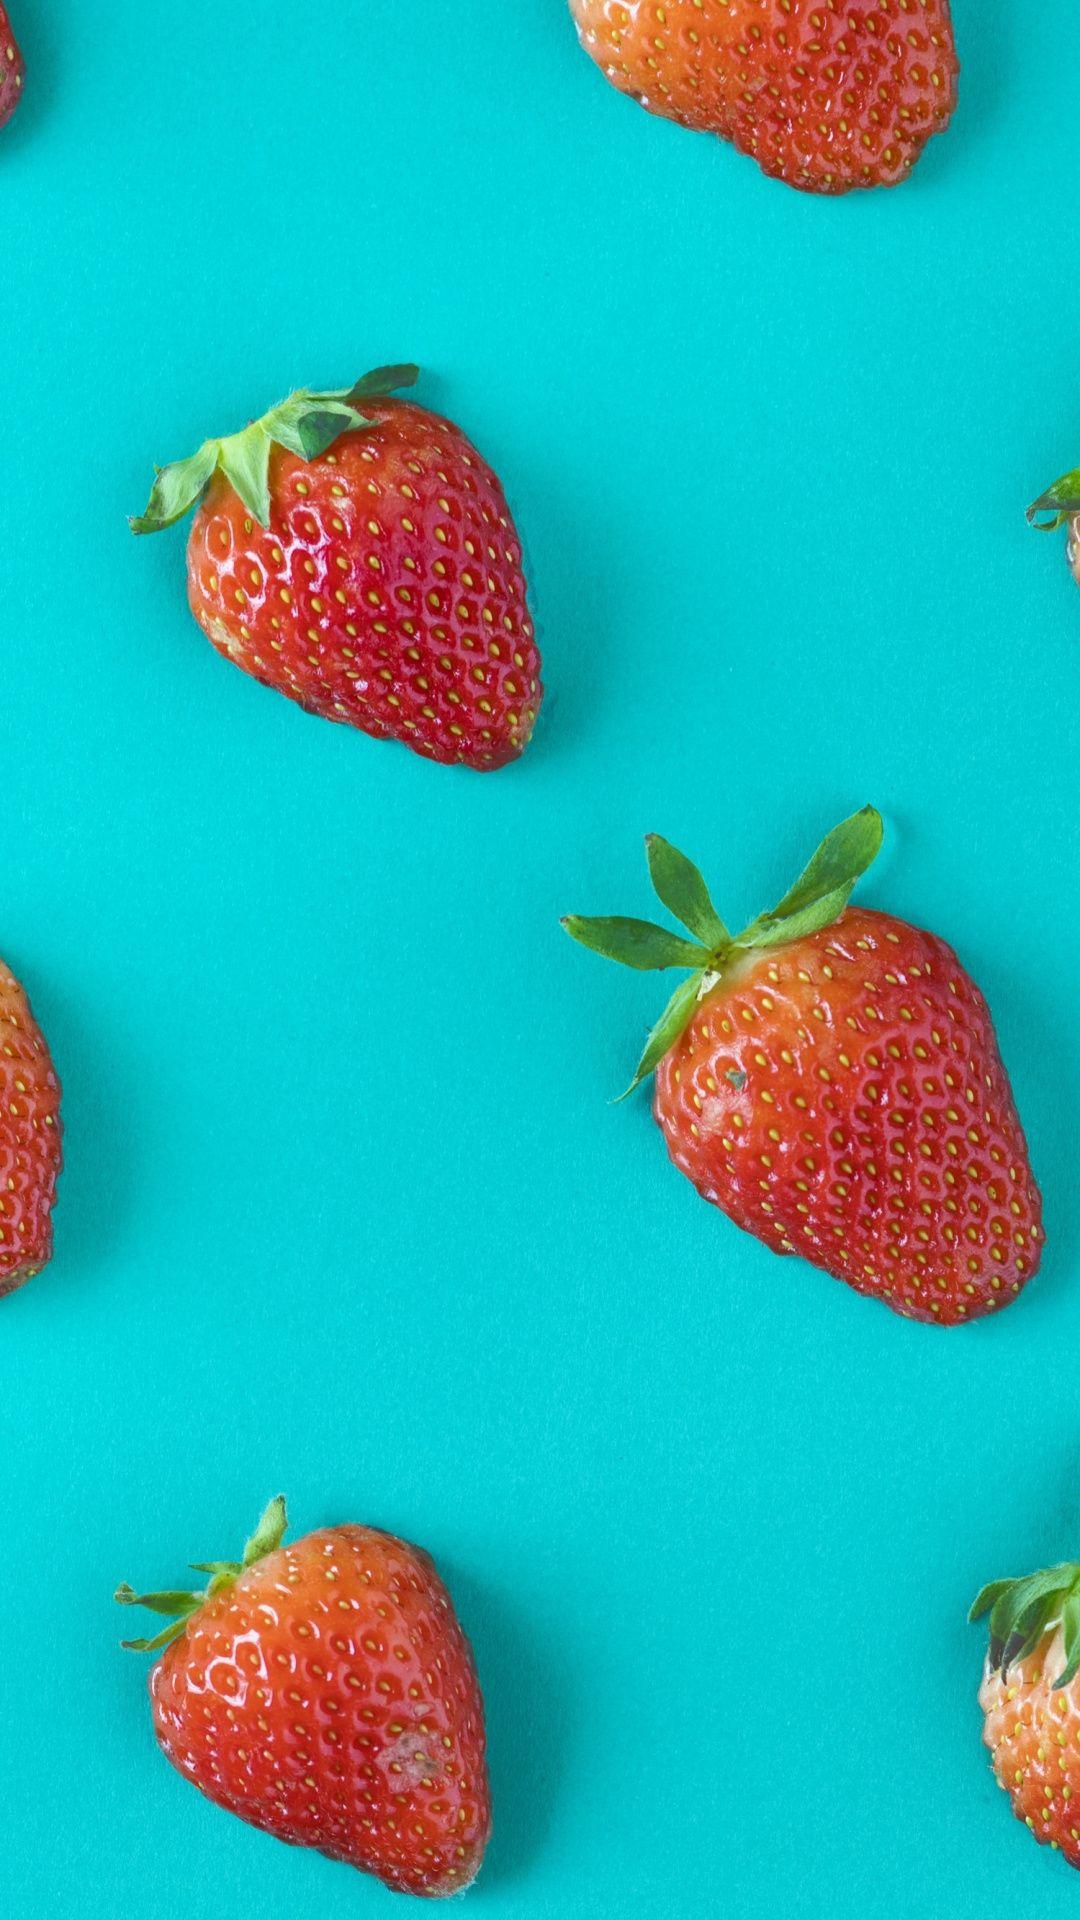 Strawberries Fruits Arranged 1080x1920 Wallpaper Fruit Wallpaper Wallpaper Free Hd Wallpapers